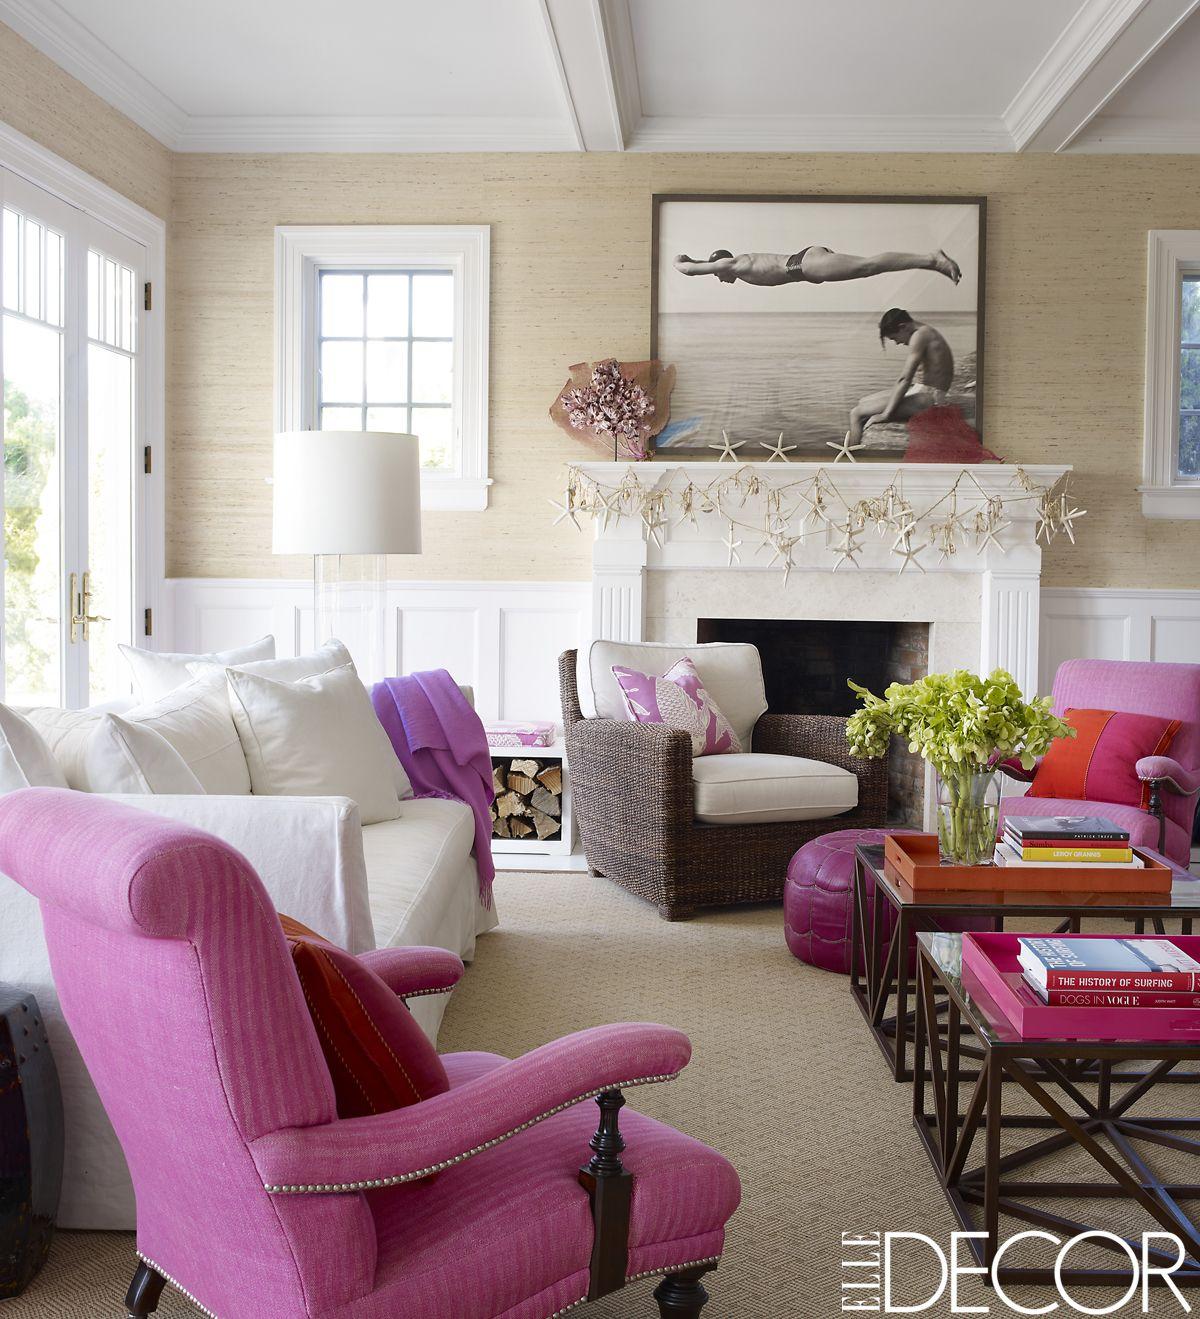 beach house interior designs pictures. beach house interior designs pictures